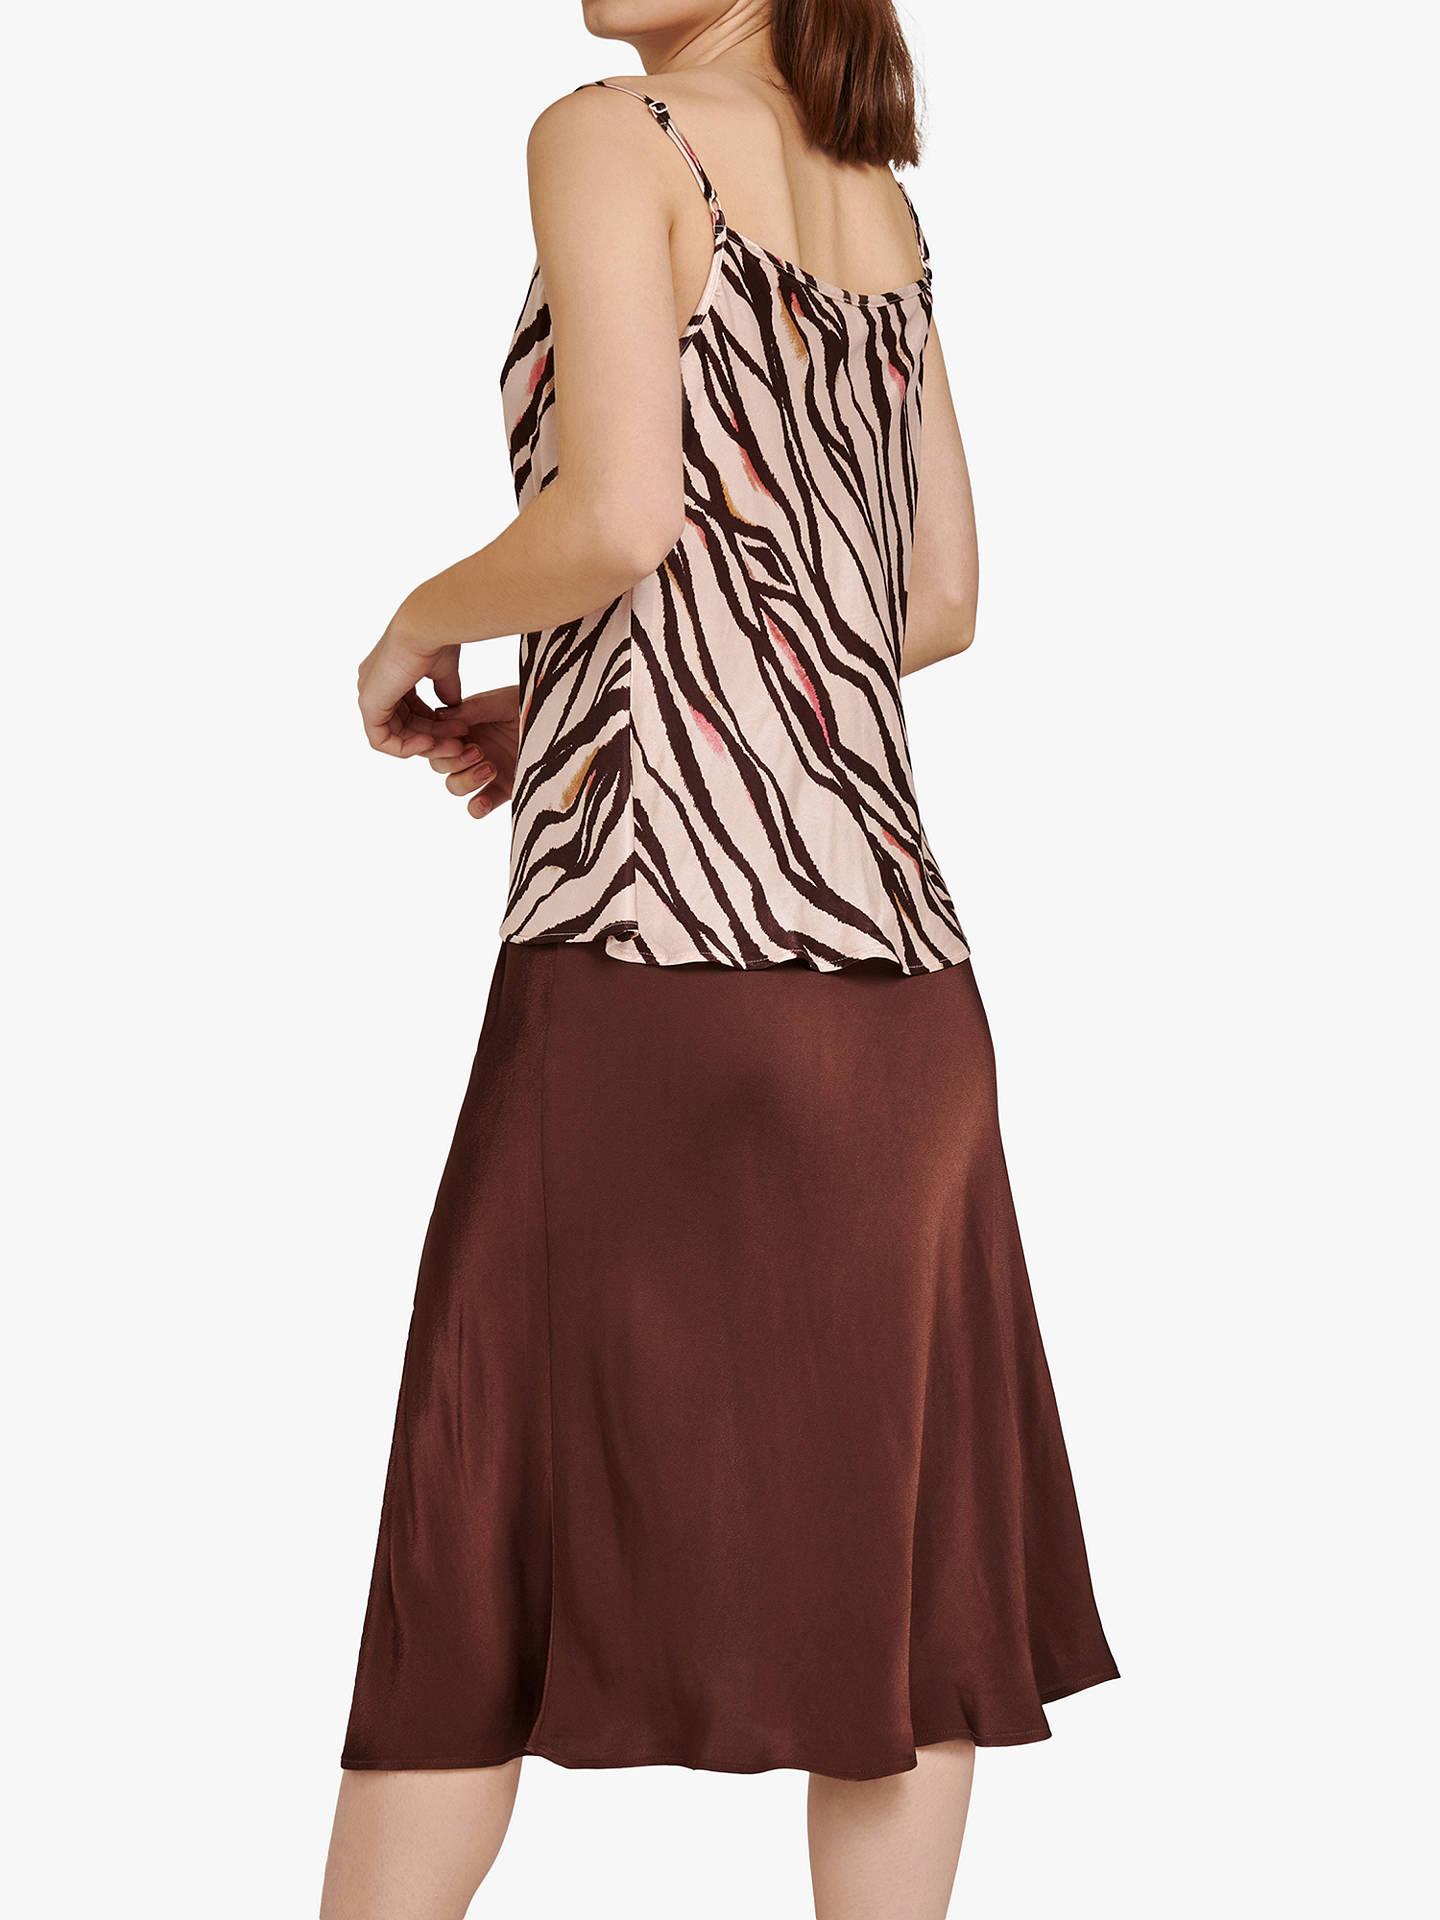 6e062eacf93e ... Buy Ghost Lipa Satin Skirt, Chocolate, XS Online at johnlewis.com ...